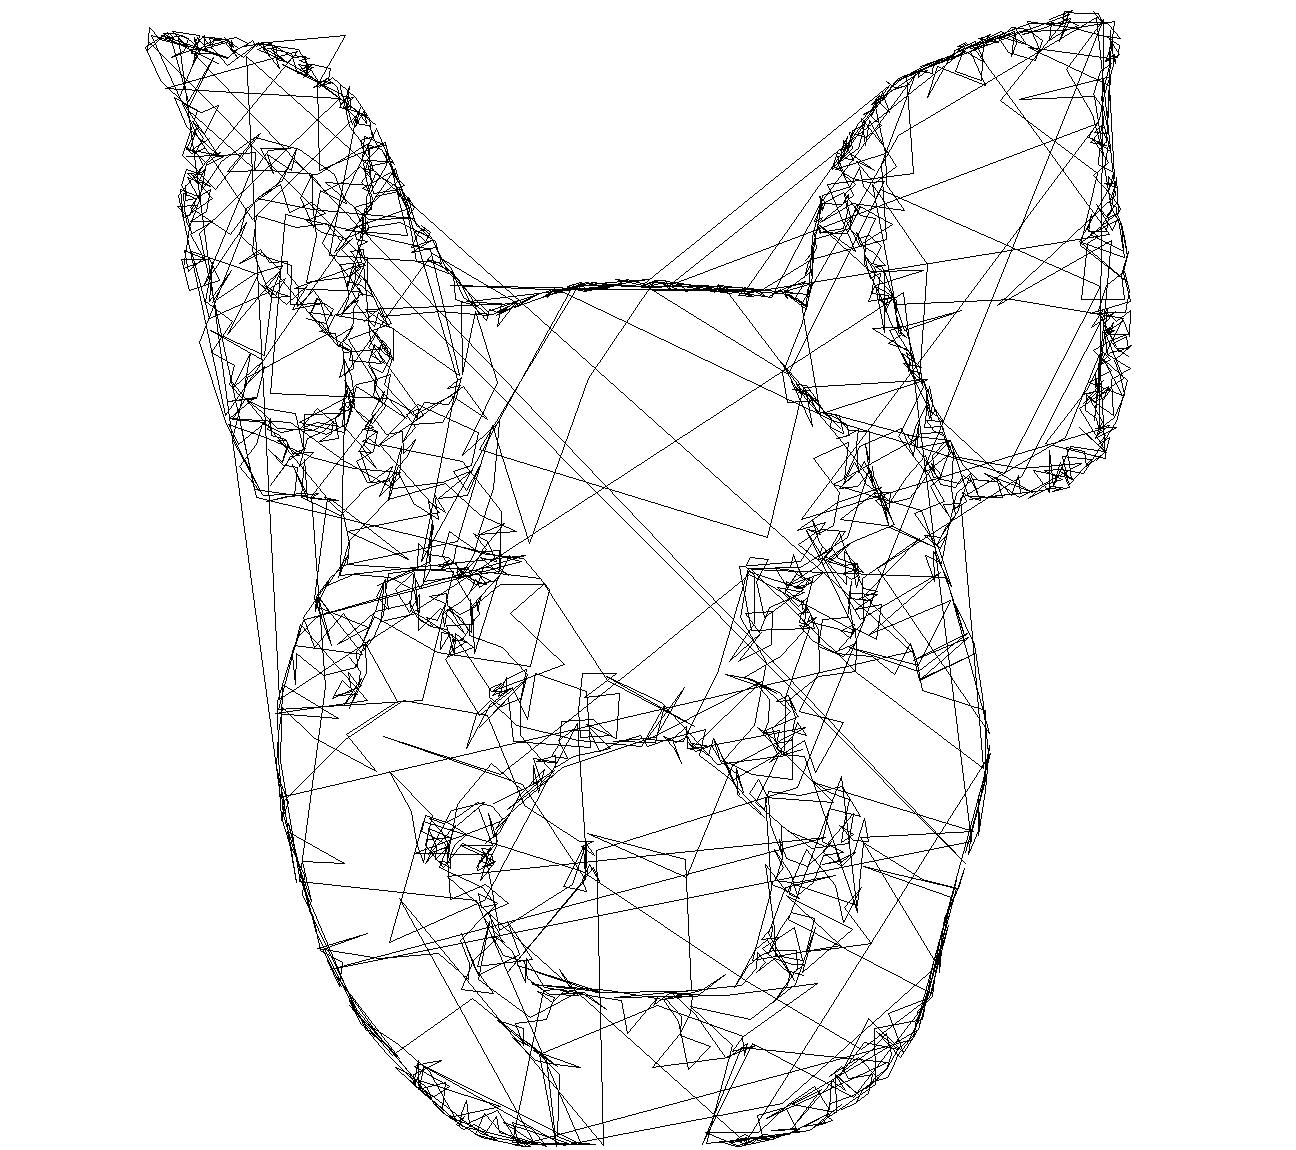 outline_image3